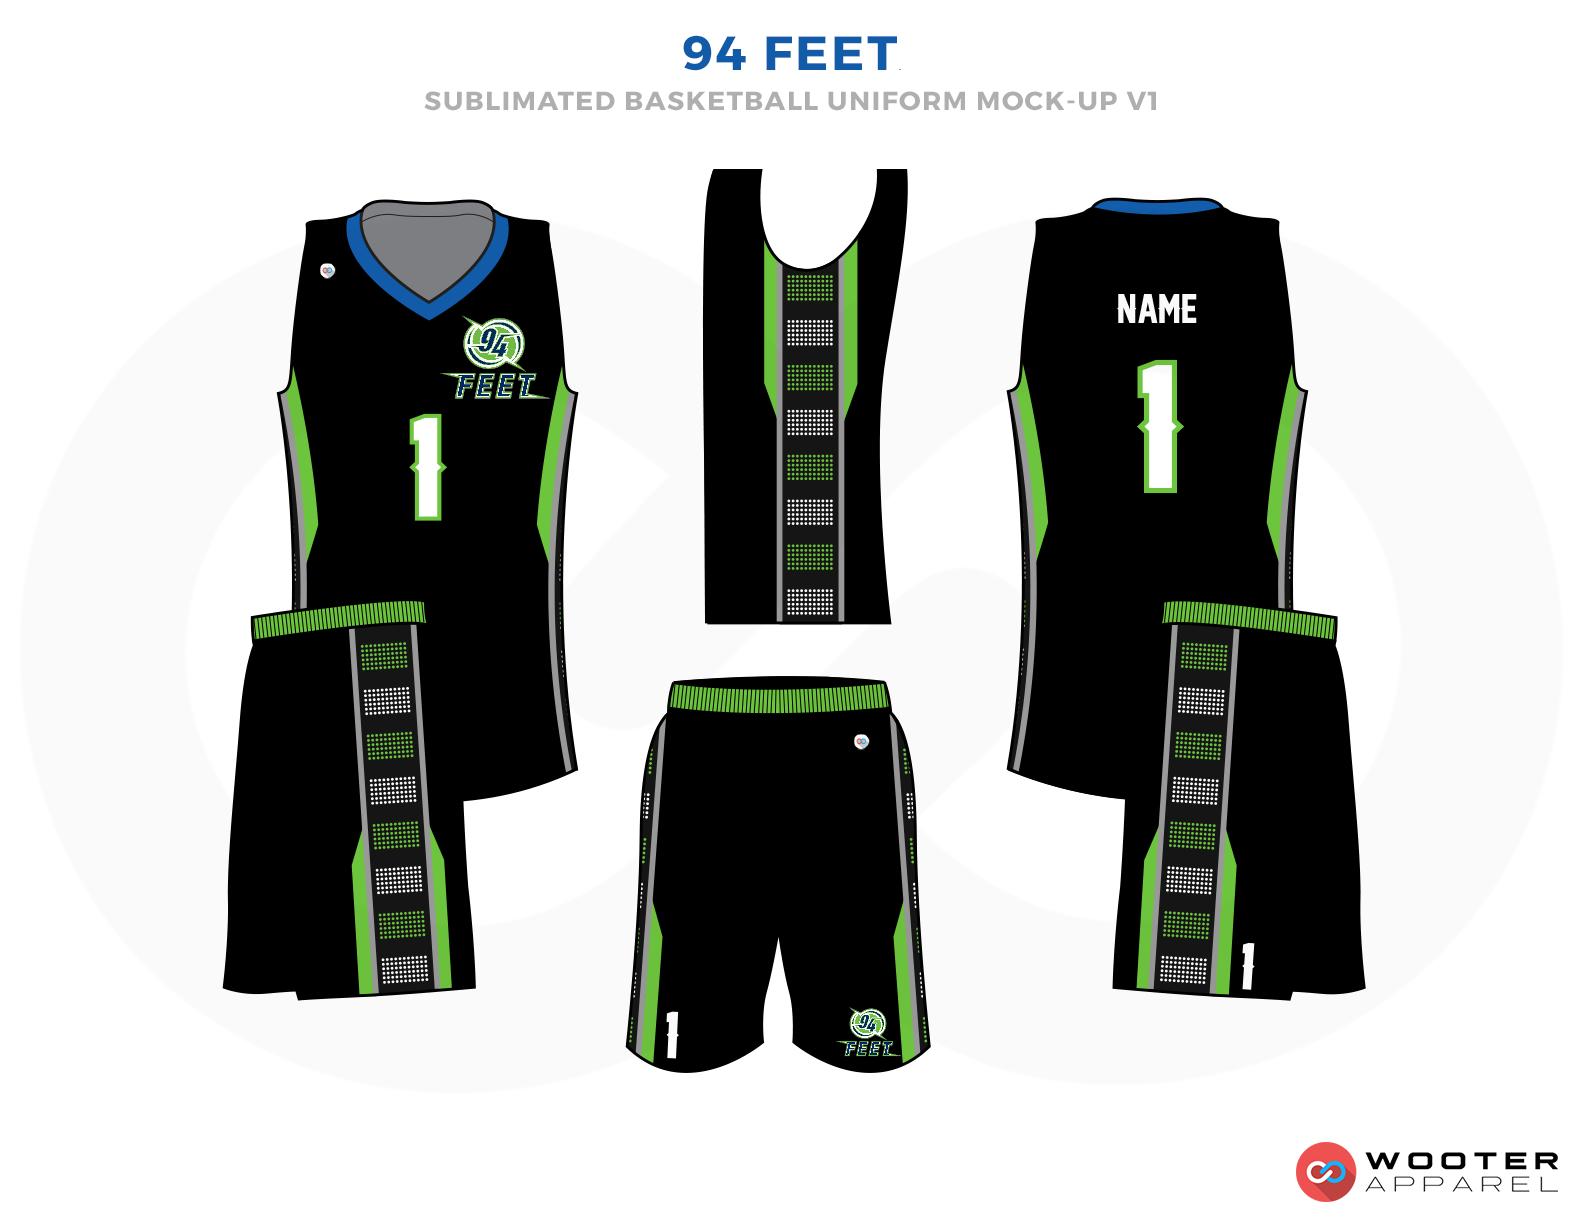 Ocatasi-BasketballUniform-mock-v1.png